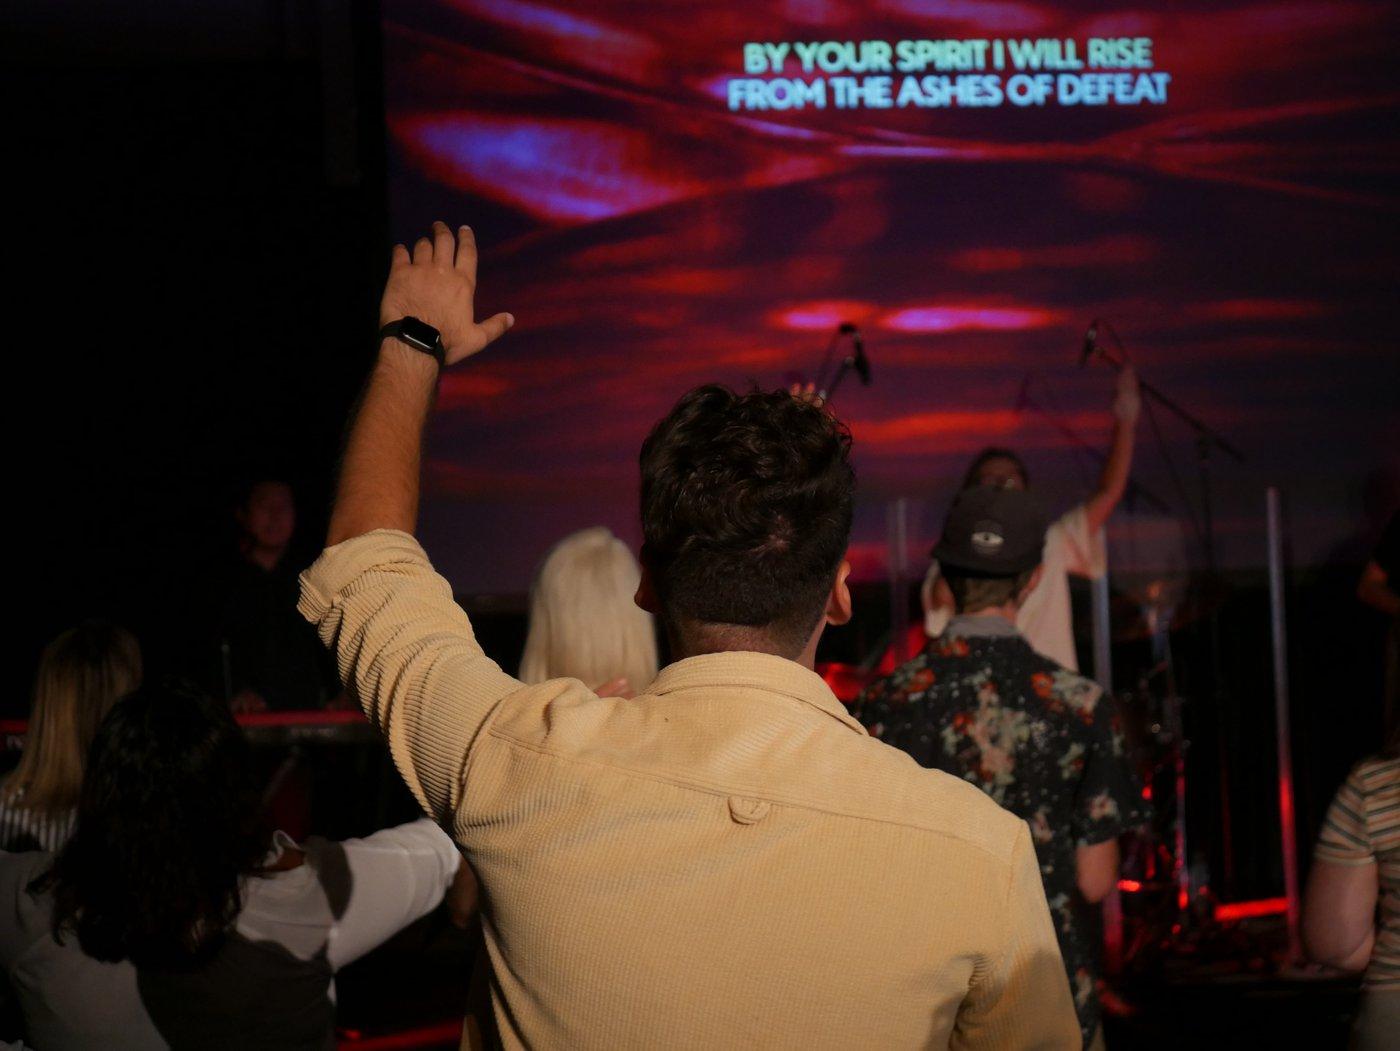 God wants eternal life alongside you